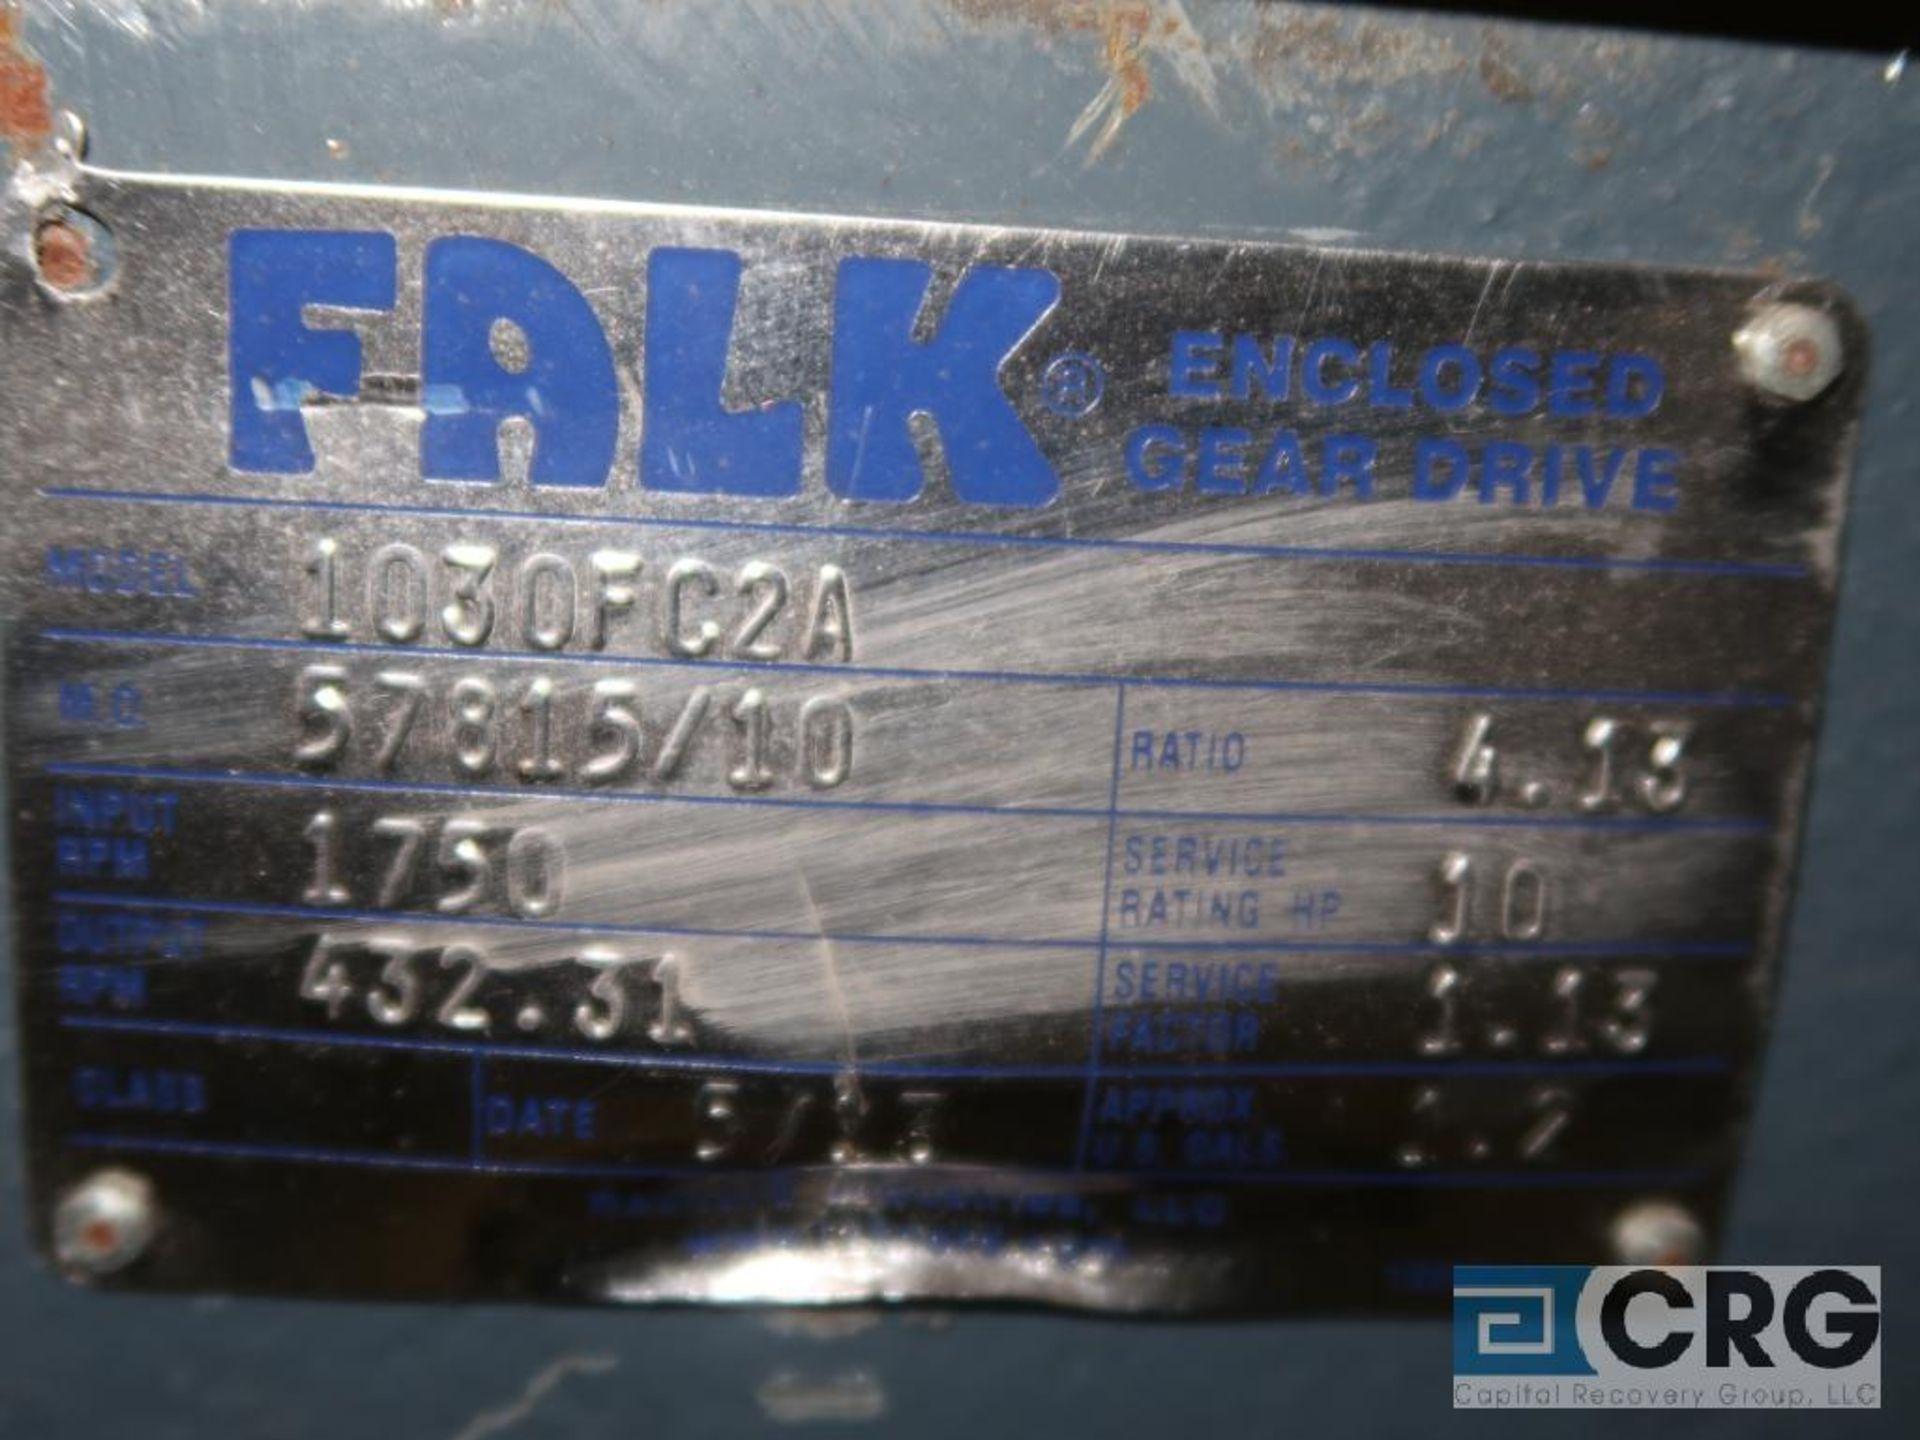 Falk 1030 FC2A gear drive, ratio 4.048, 1,750/432.31 RPM (Finish Building) - Image 2 of 2